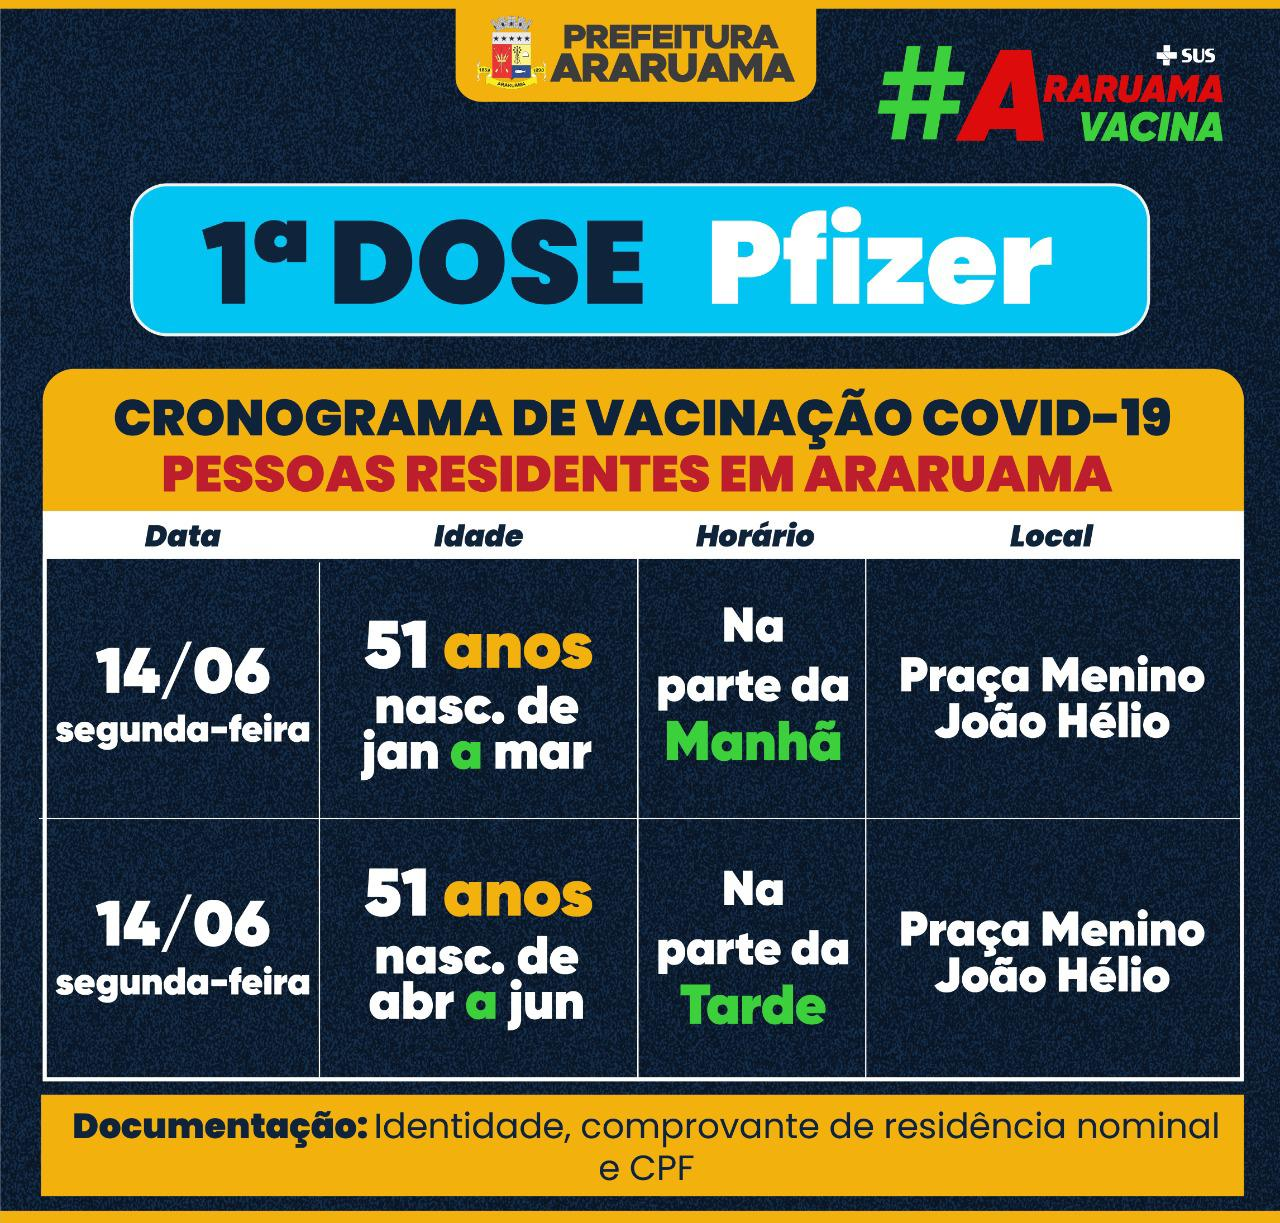 Araruama vai aplicar as primeiras doses da vacina Pfizer na próxima segunda-feira